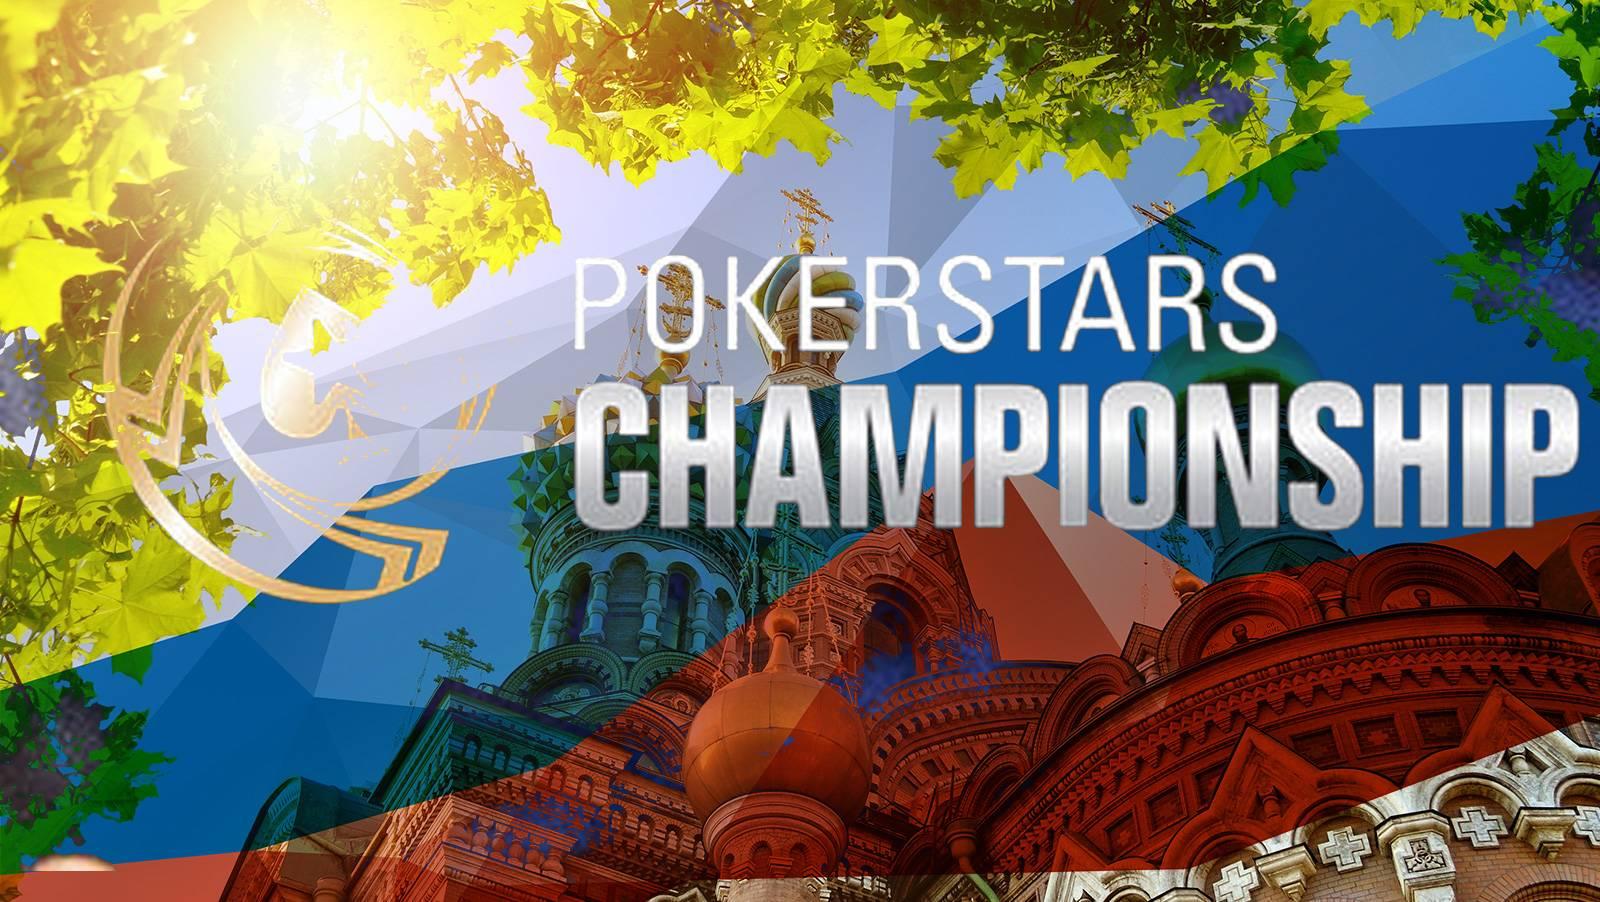 Pokerstars Championship Sochi 2017